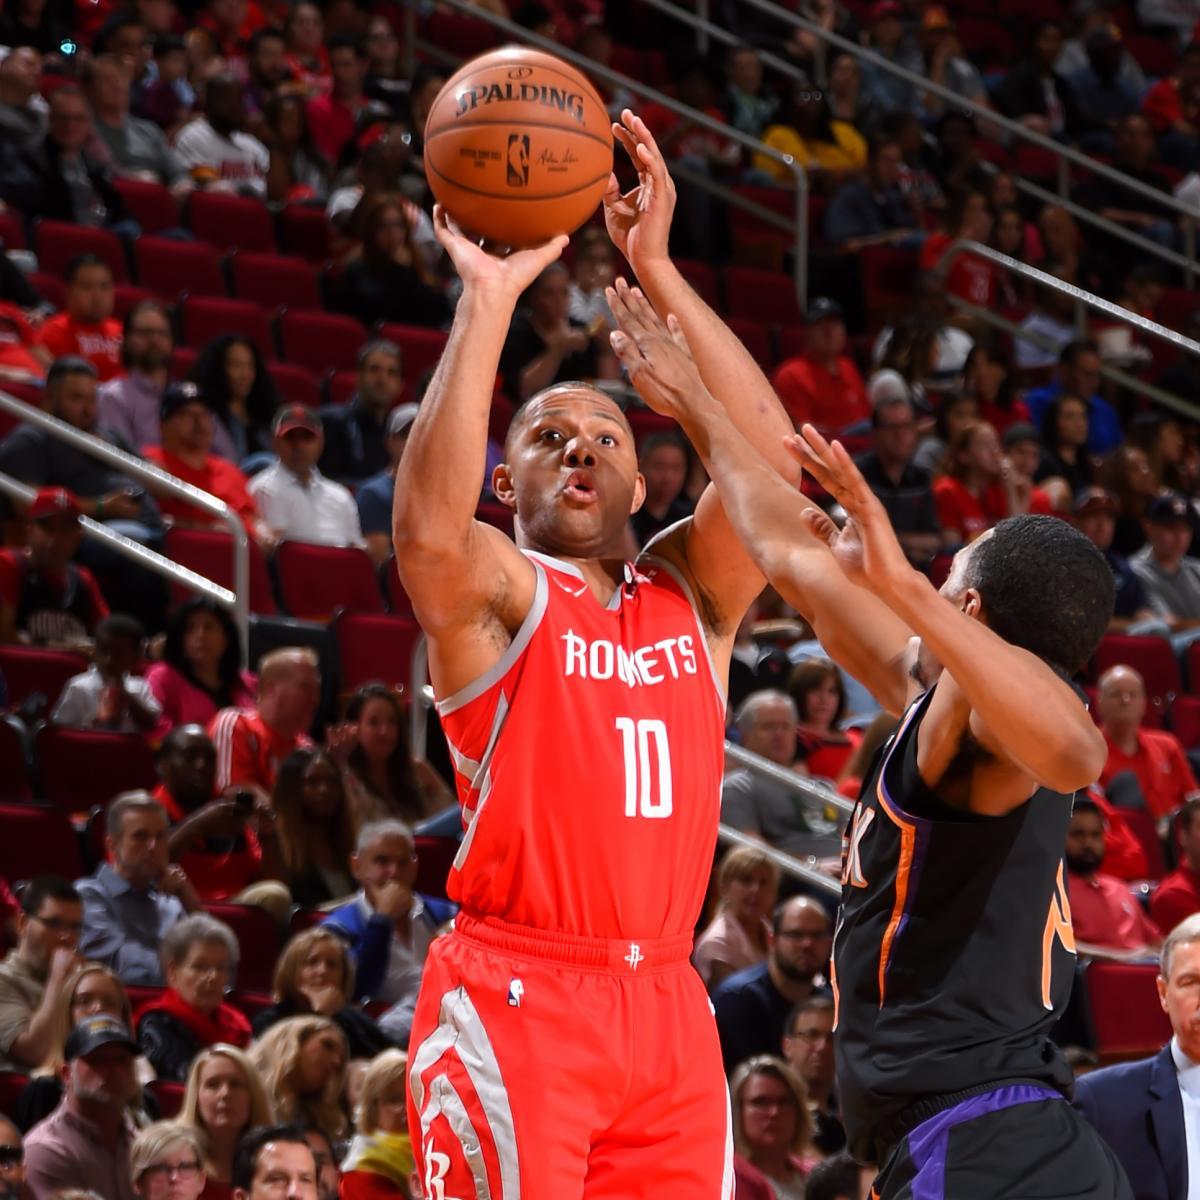 James Harden Records 2019: Video: Watch James Harden, Rockets Make NBA-Record 27